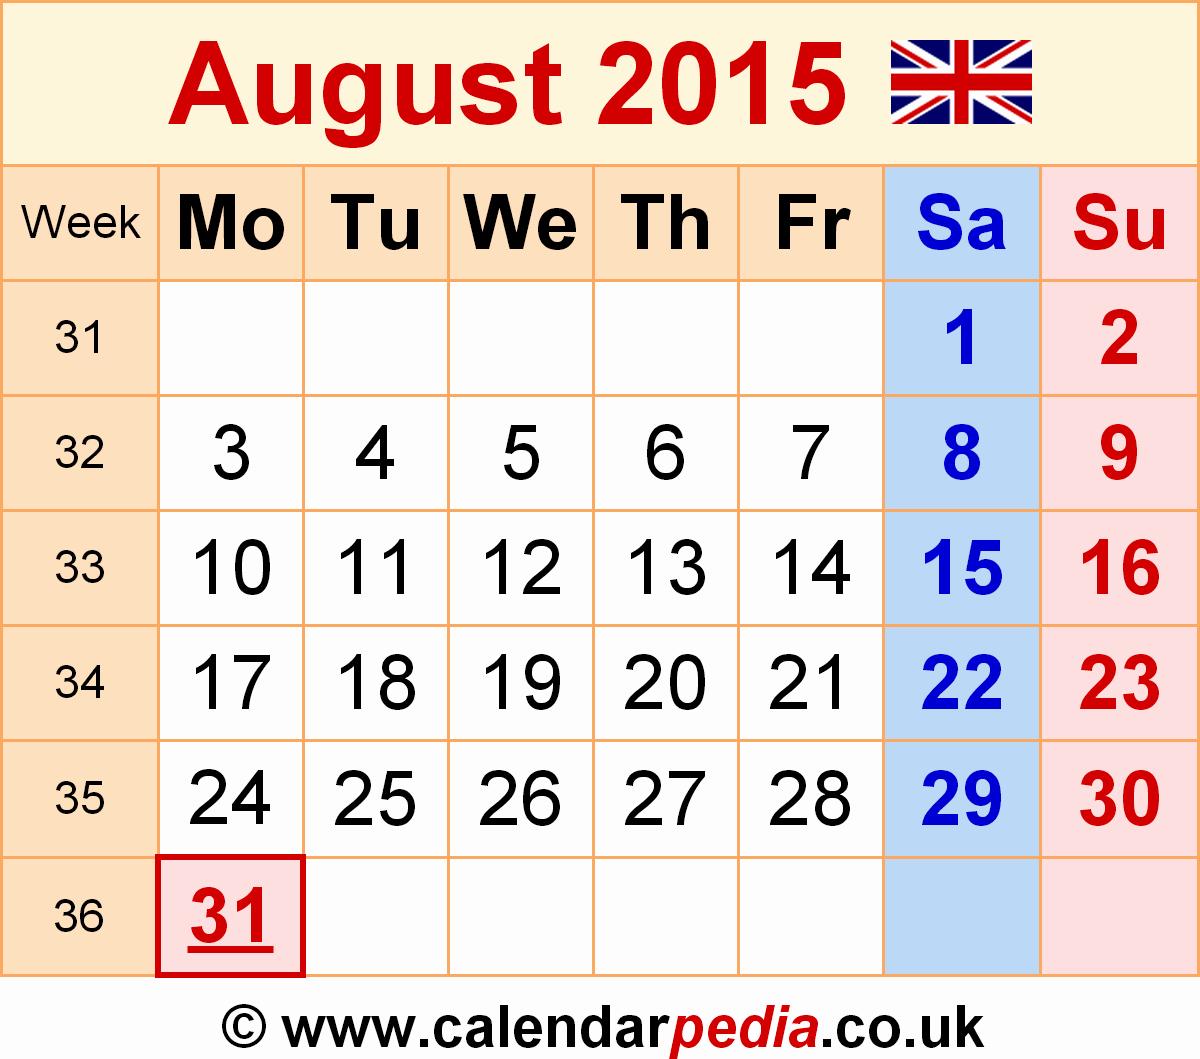 Free Calendar Templates August 2015 Fresh Calendar August 2015 Uk Bank Holidays Excel Pdf Word